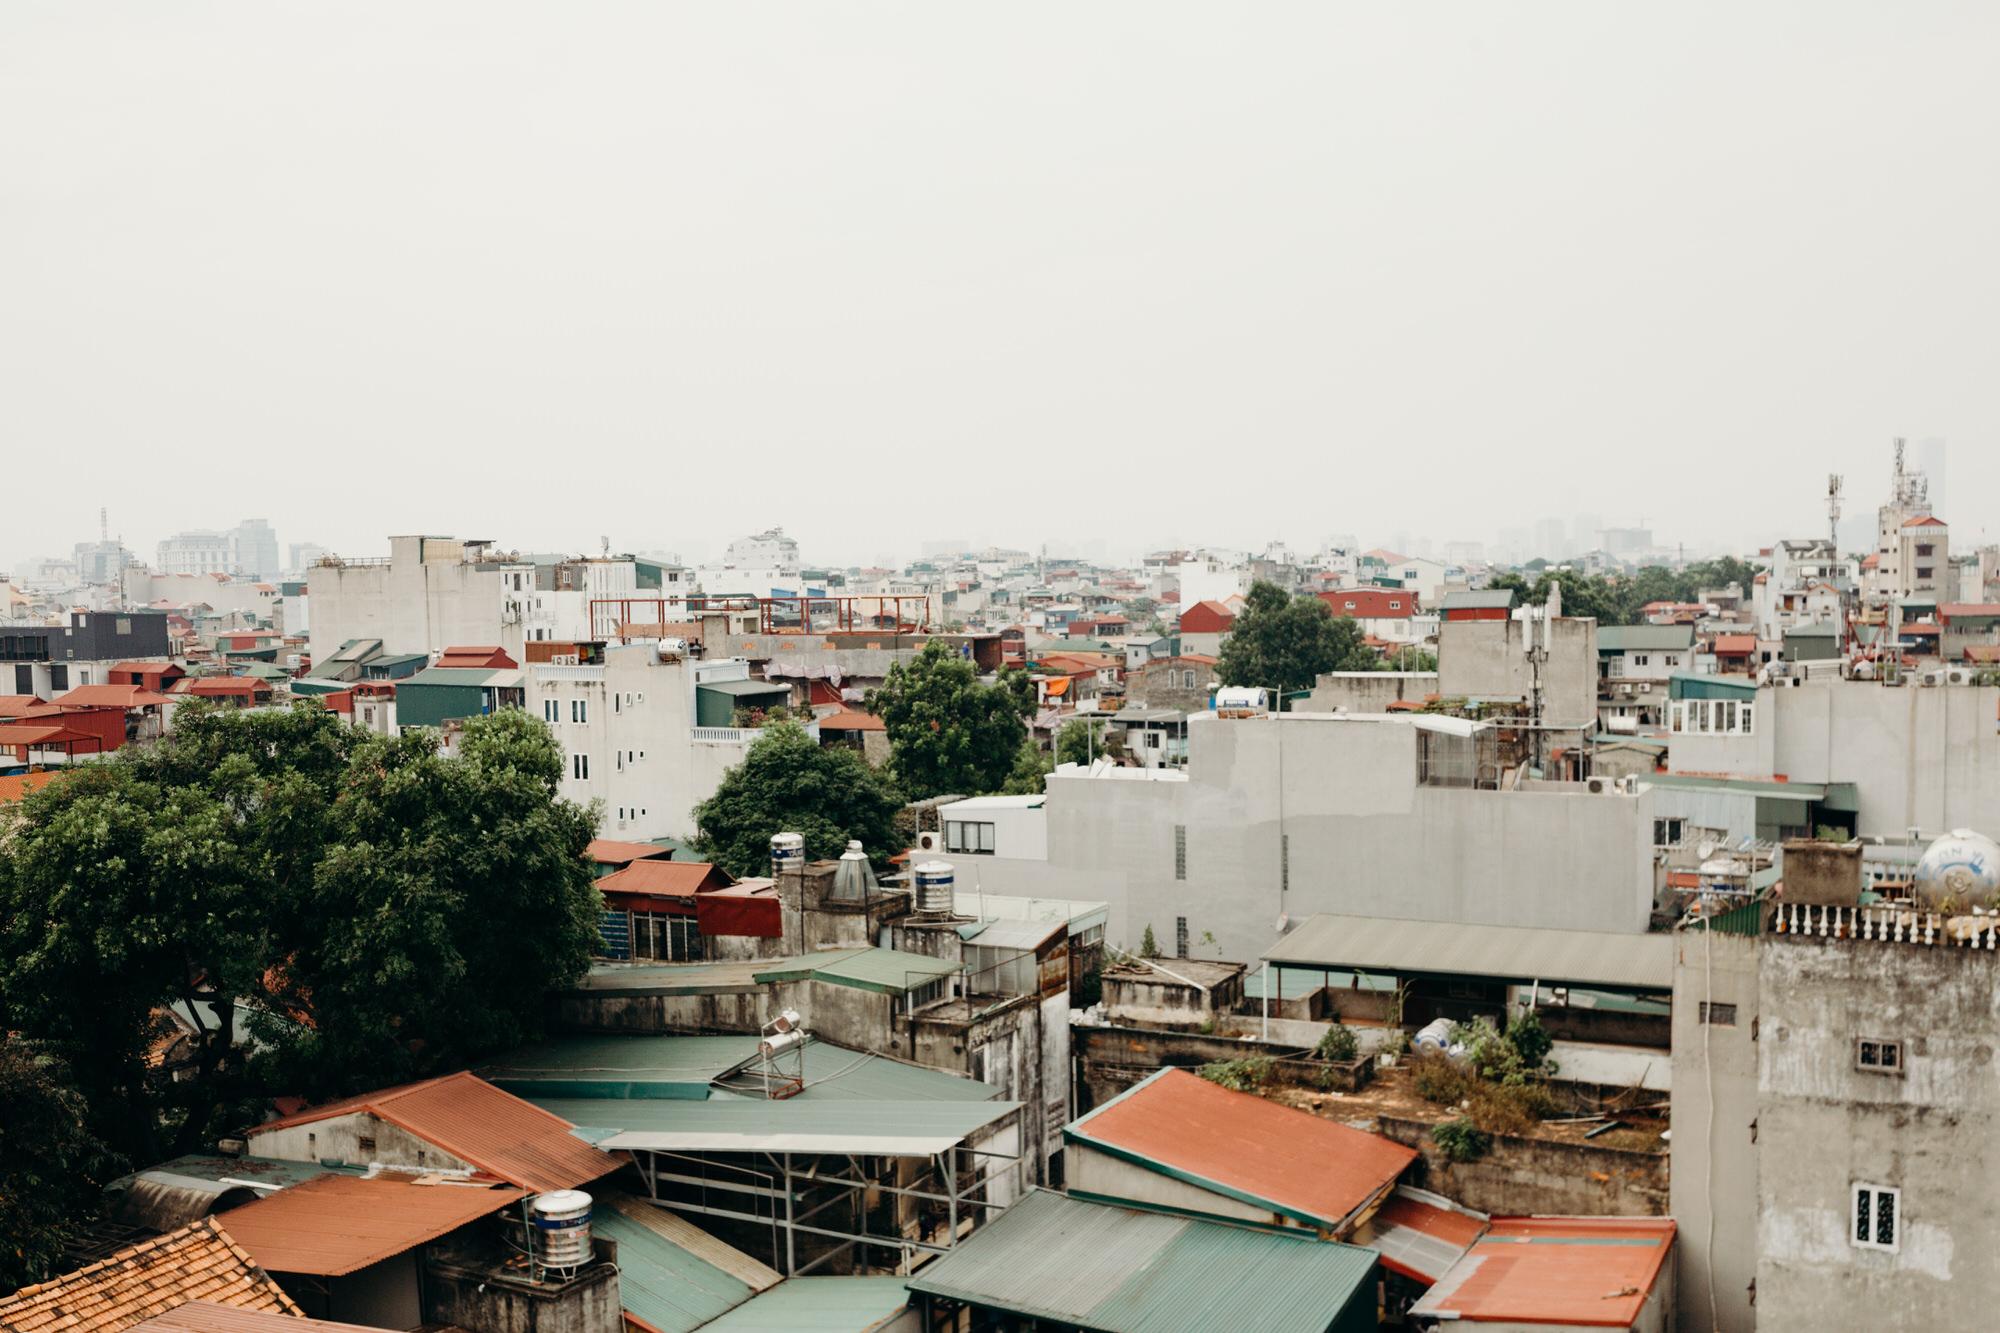 hanoivietnamtravelblog-9691-1.jpg